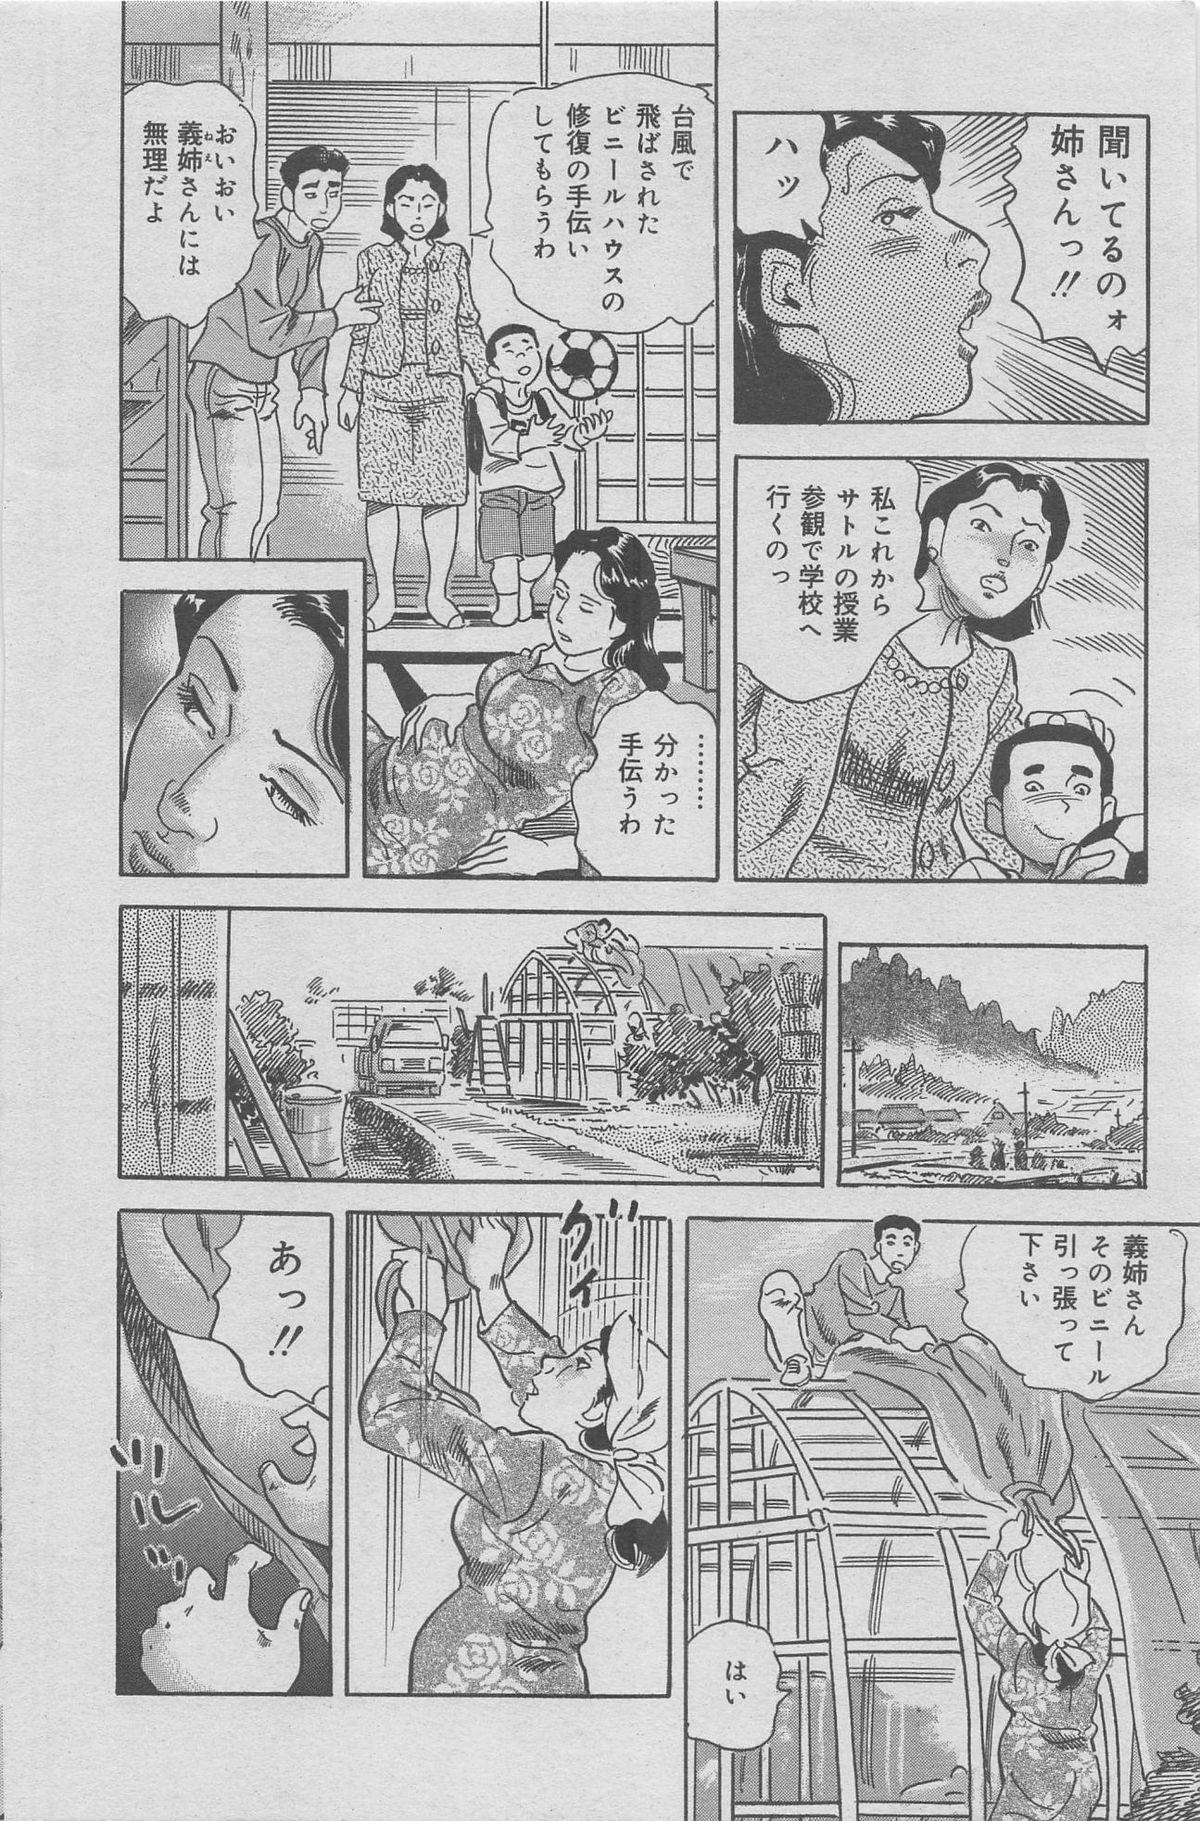 Hontou ni Atta Kindanai vol.7 85